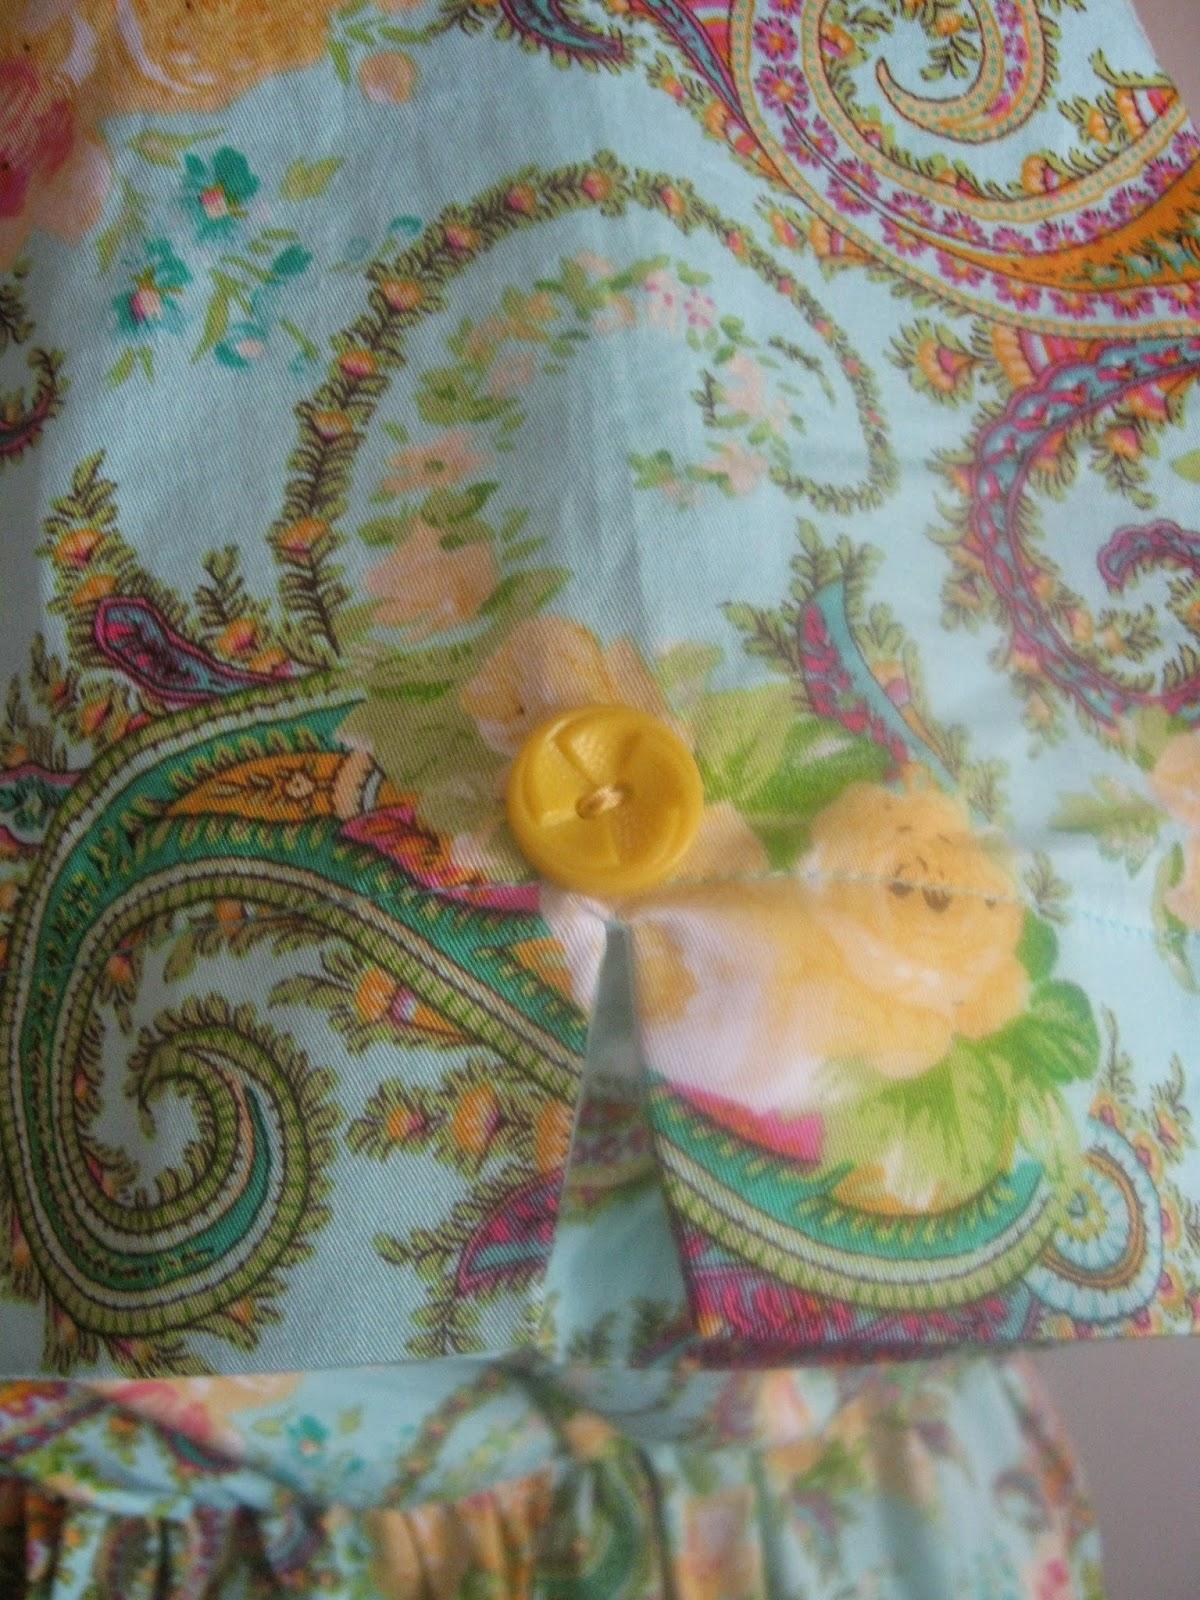 New Look A6180 Aqua Paisley Shirt Dress Sleeve Detail View www.sewplus.blogspot.com